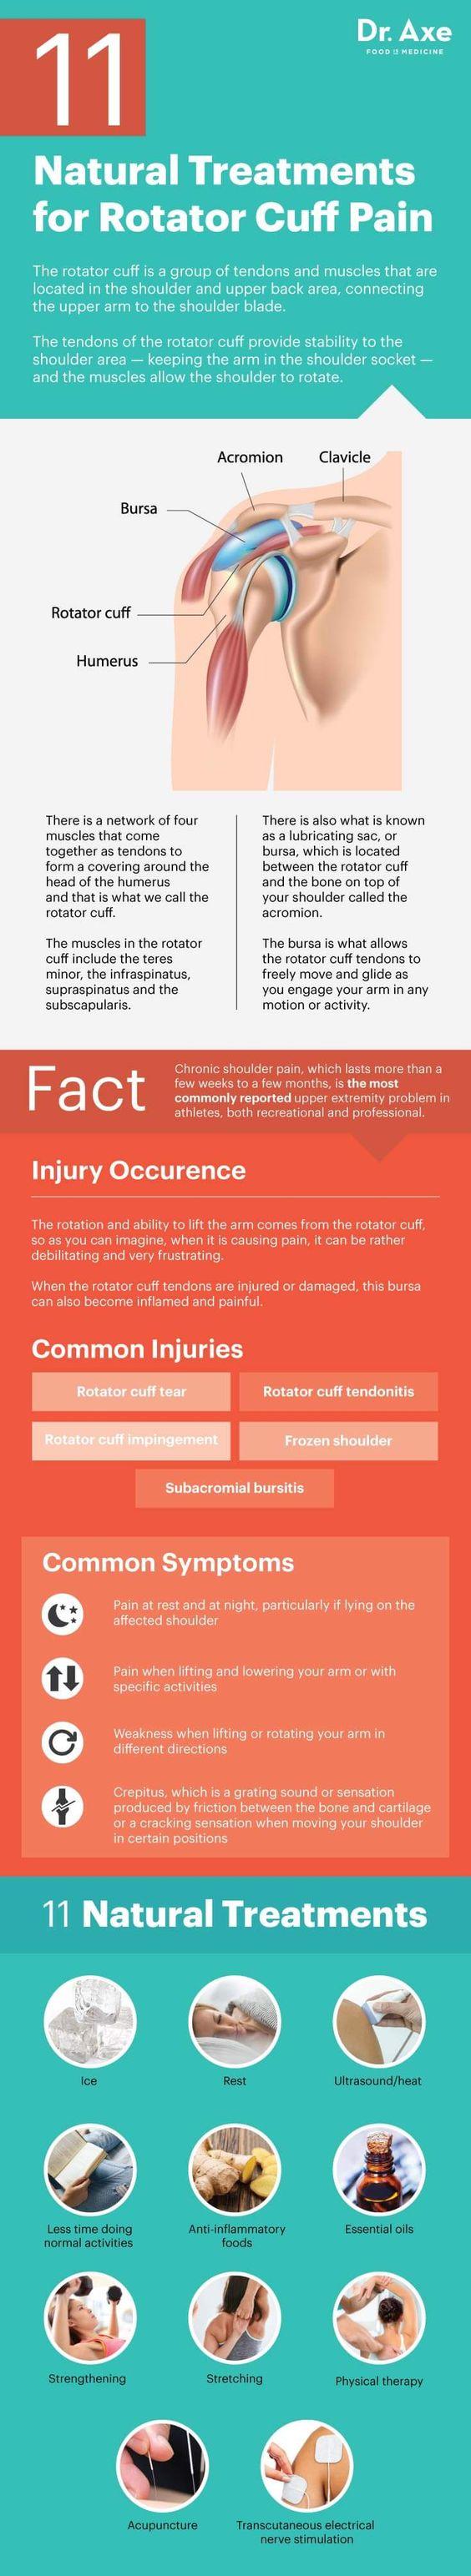 Rotator cuff pain - Dr. Axe http://www.draxe.com #health #holistic #natural